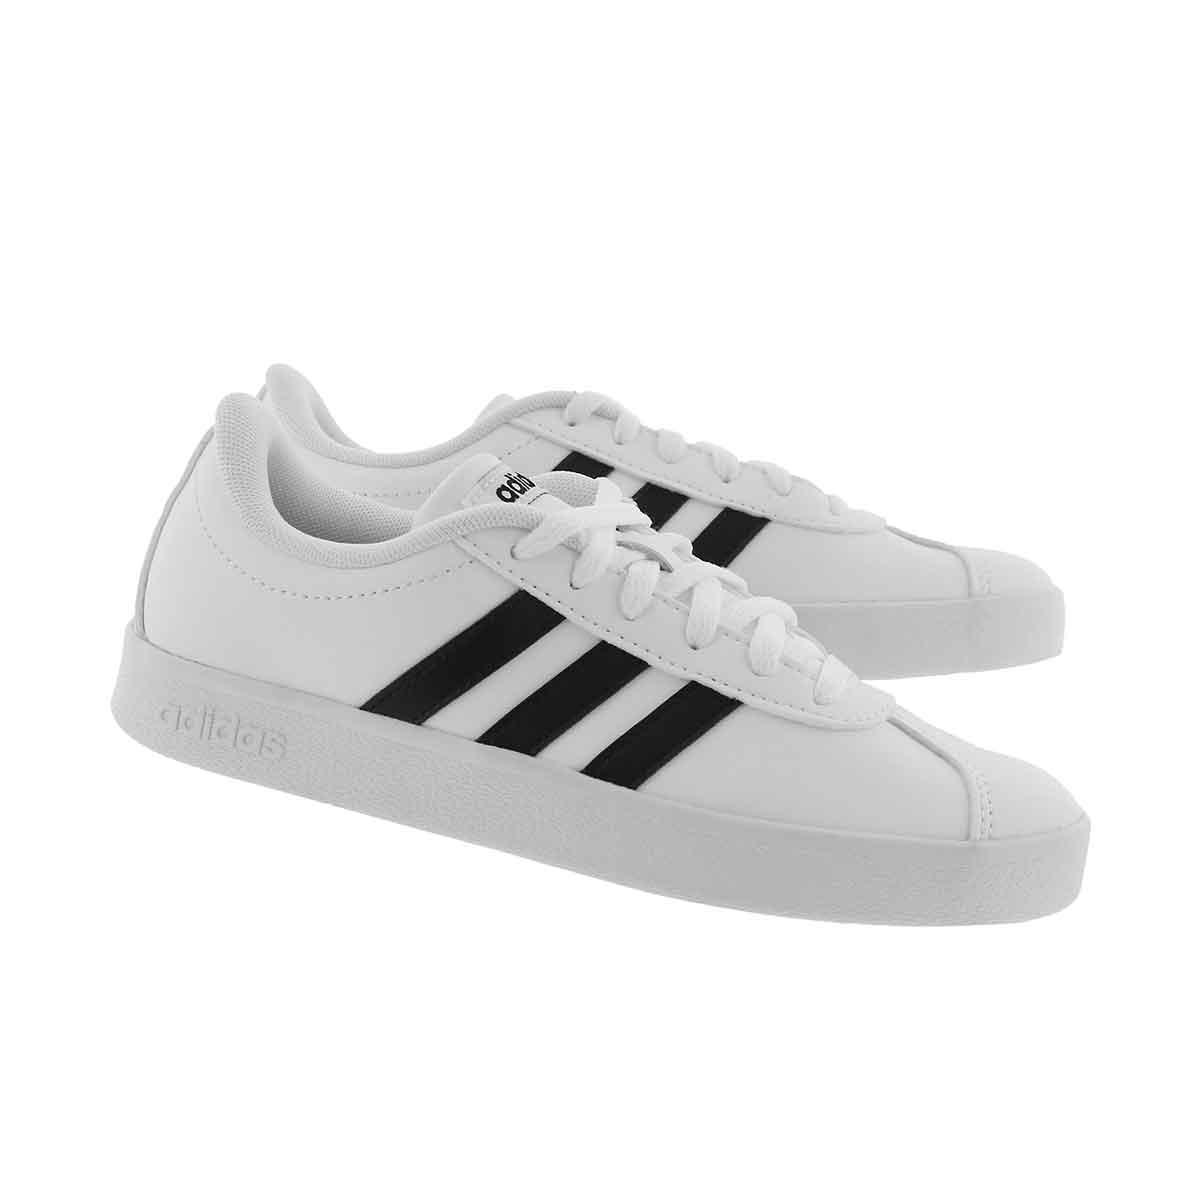 Chlds VL Court 2.0 wht/blk sneaker